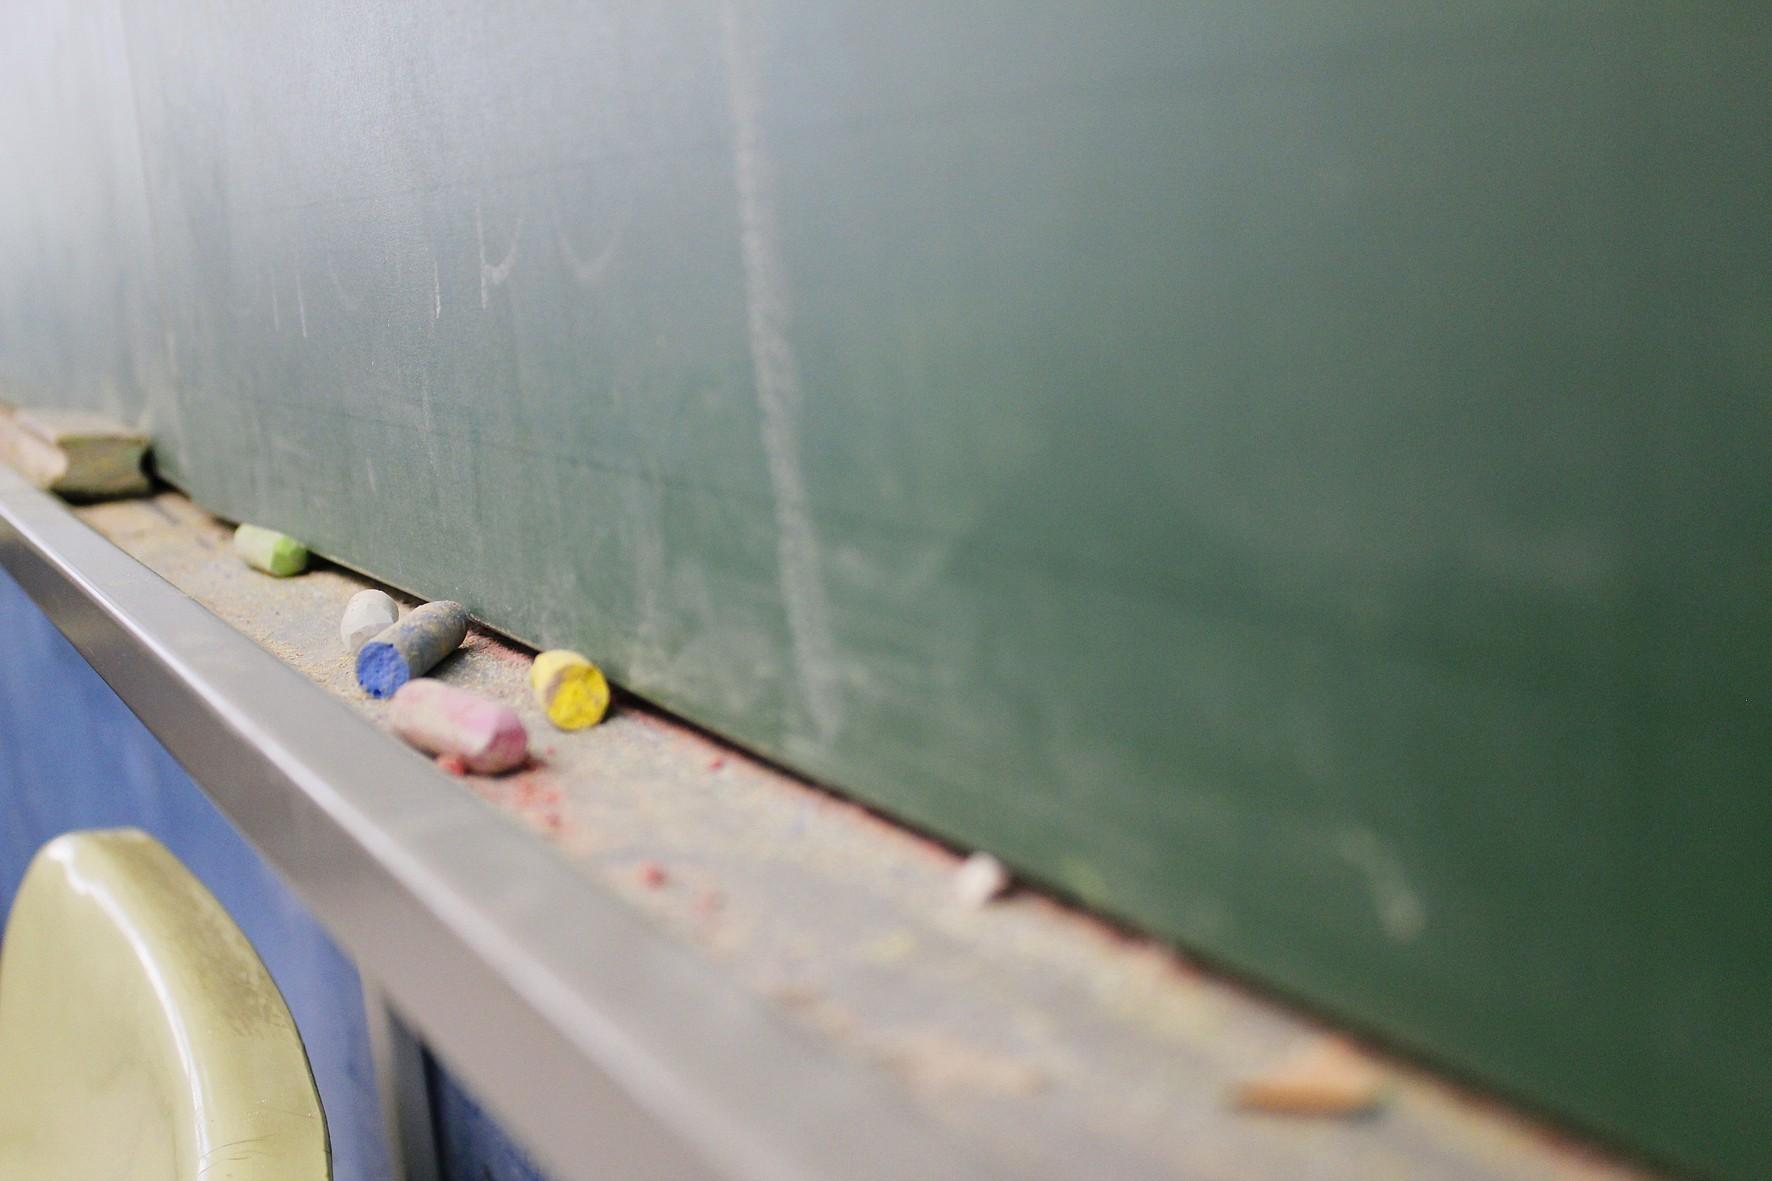 Sala de aula. Foto: Marcos Santos/USP Imagens